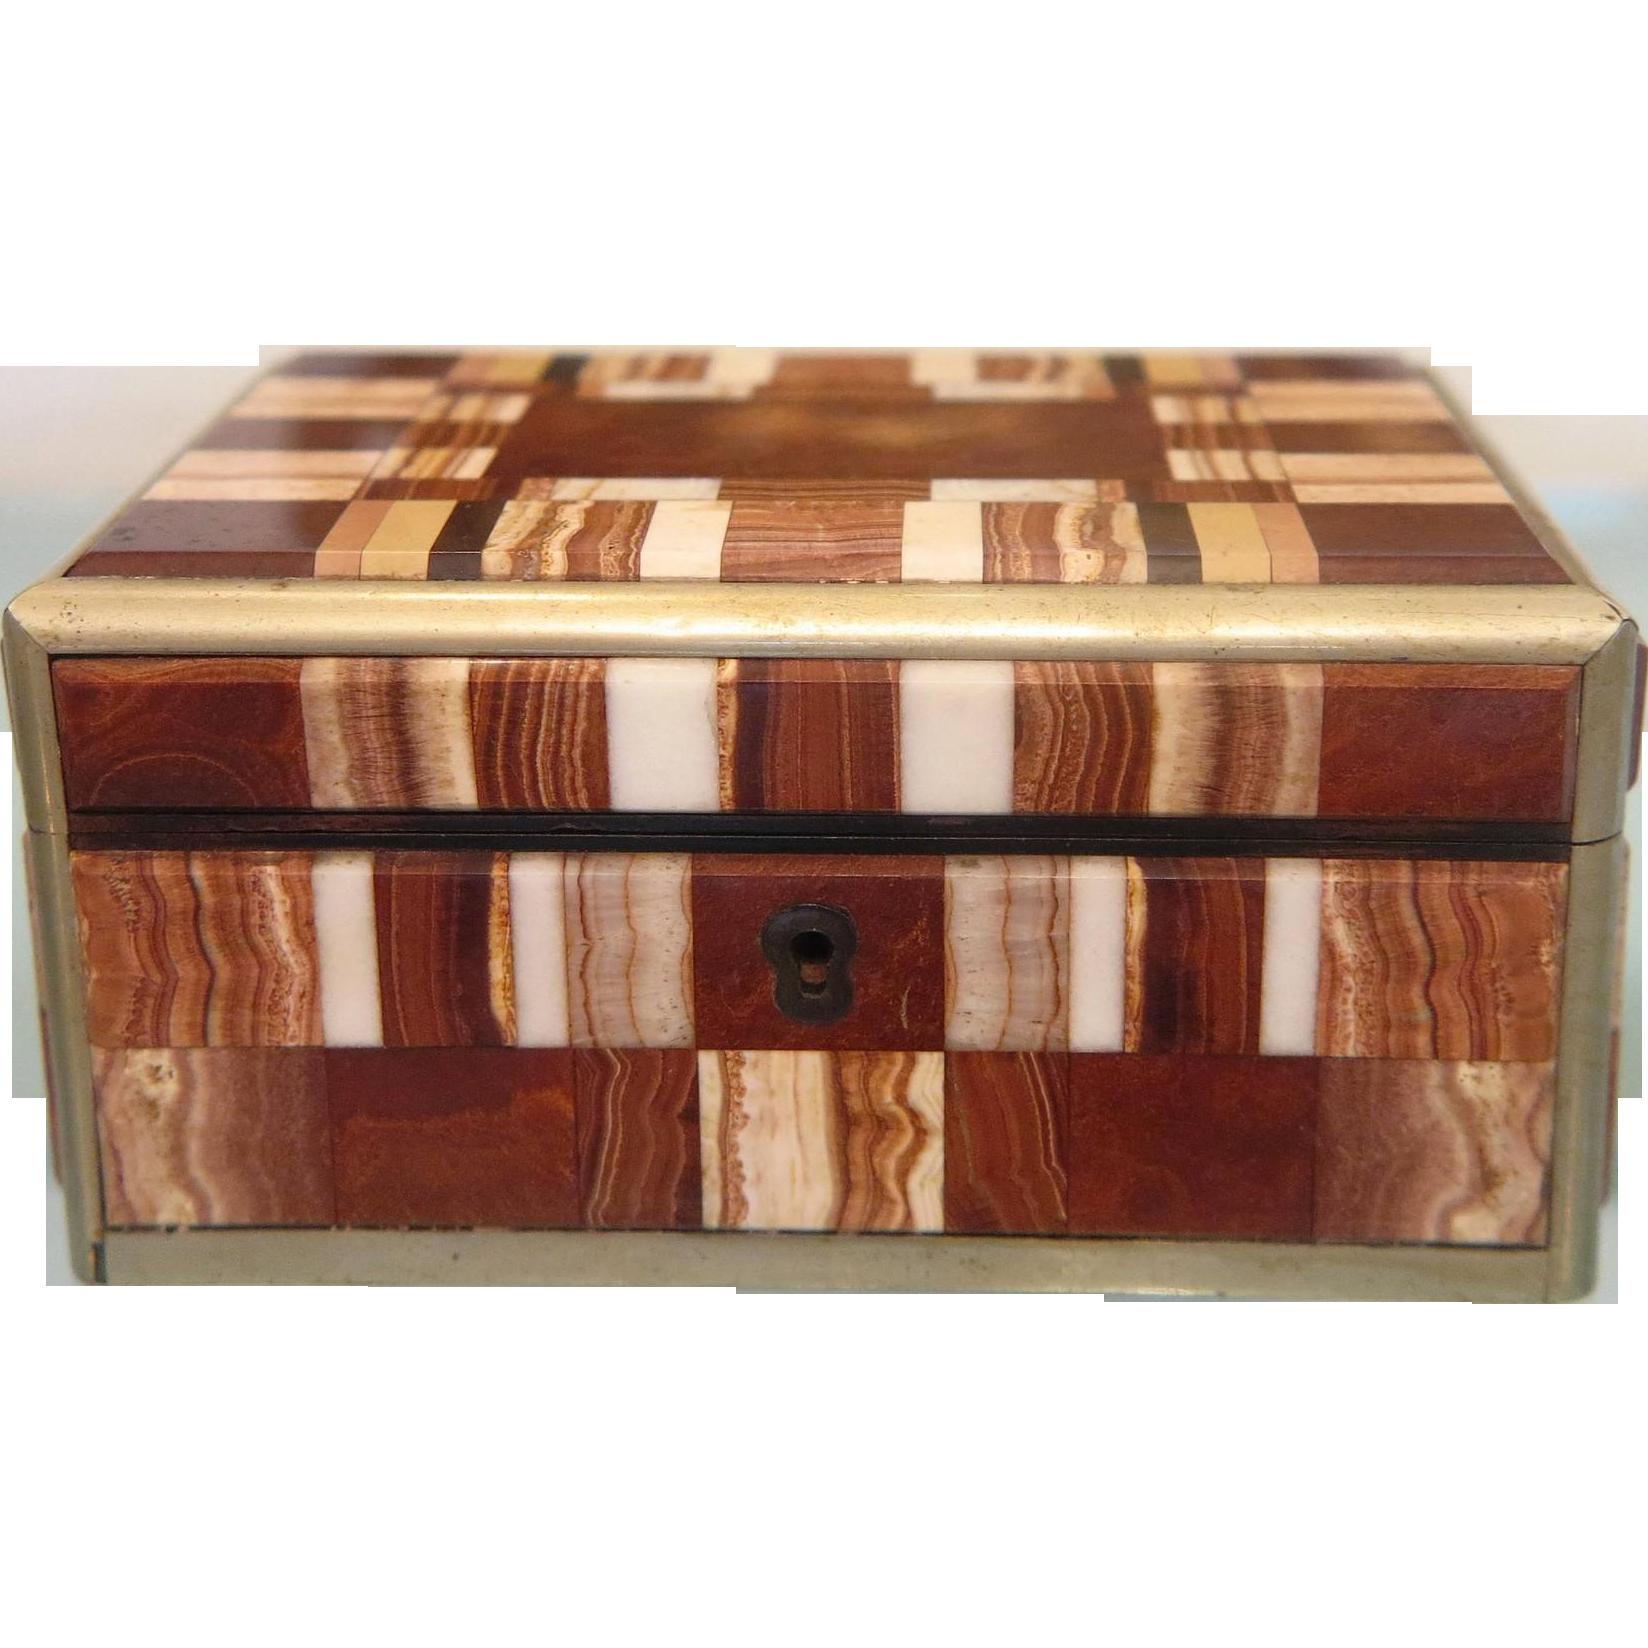 Antique Pietra Dura Karlsbad box, 19th century